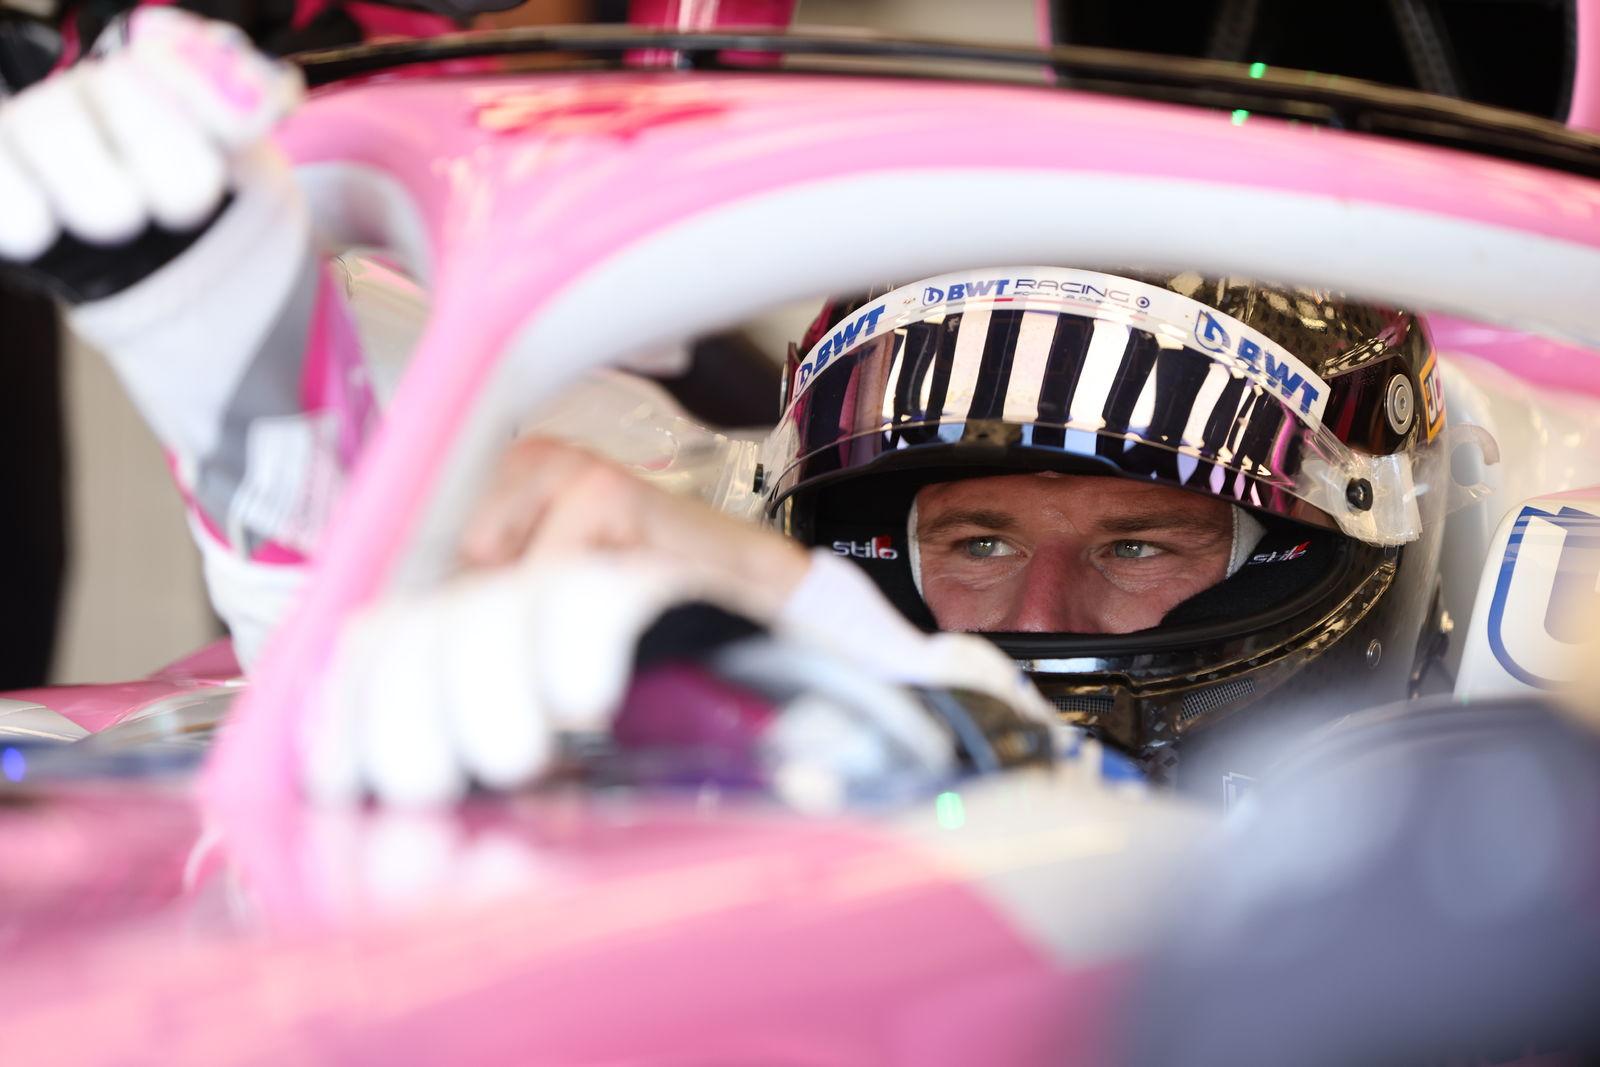 Officiel : Hülkenberg de retour en F1 dès ce week-end à Silverstone 1